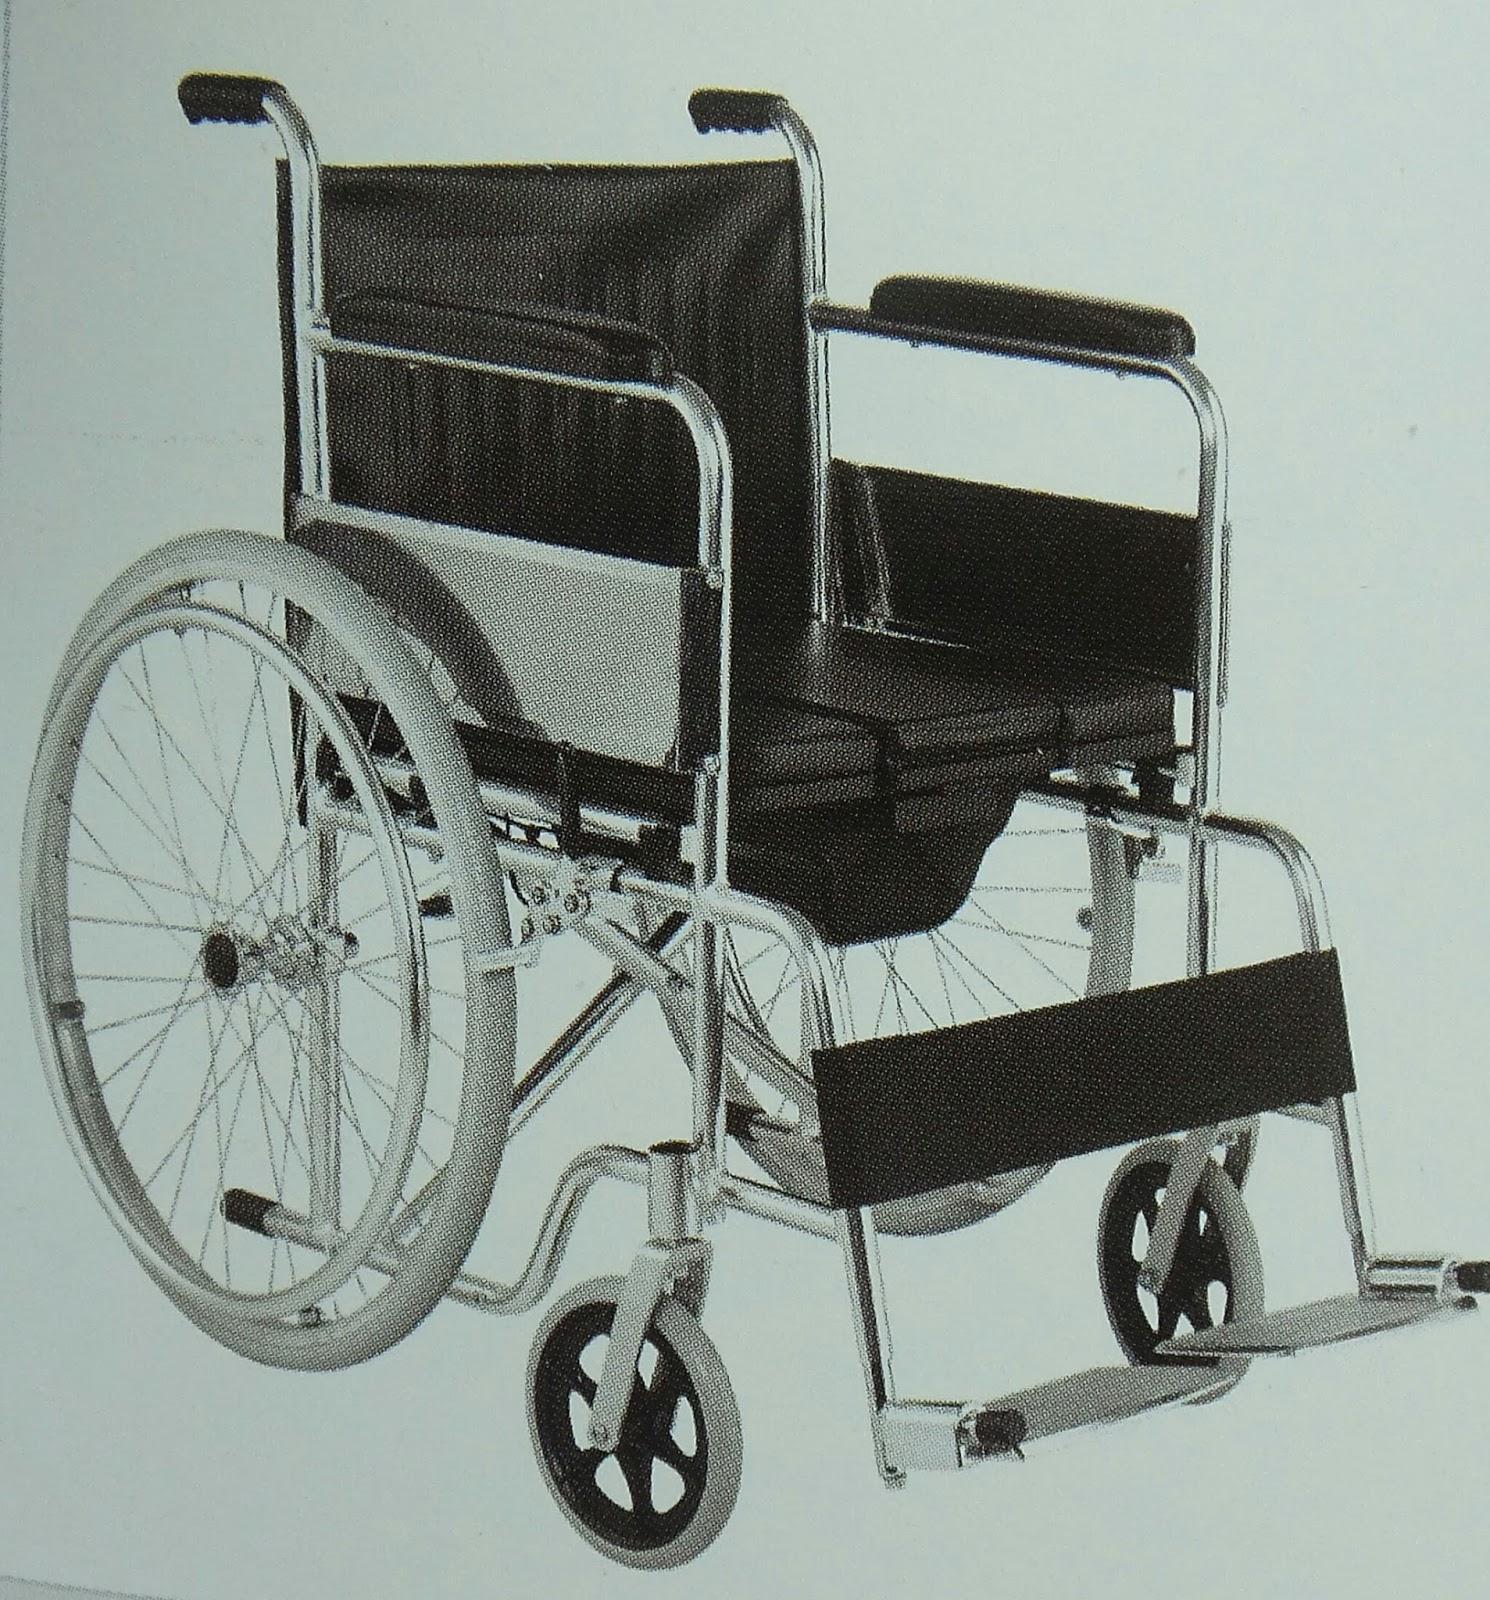 SILLAS DE RUEDAS PERU Importadores de sillas de ruedas